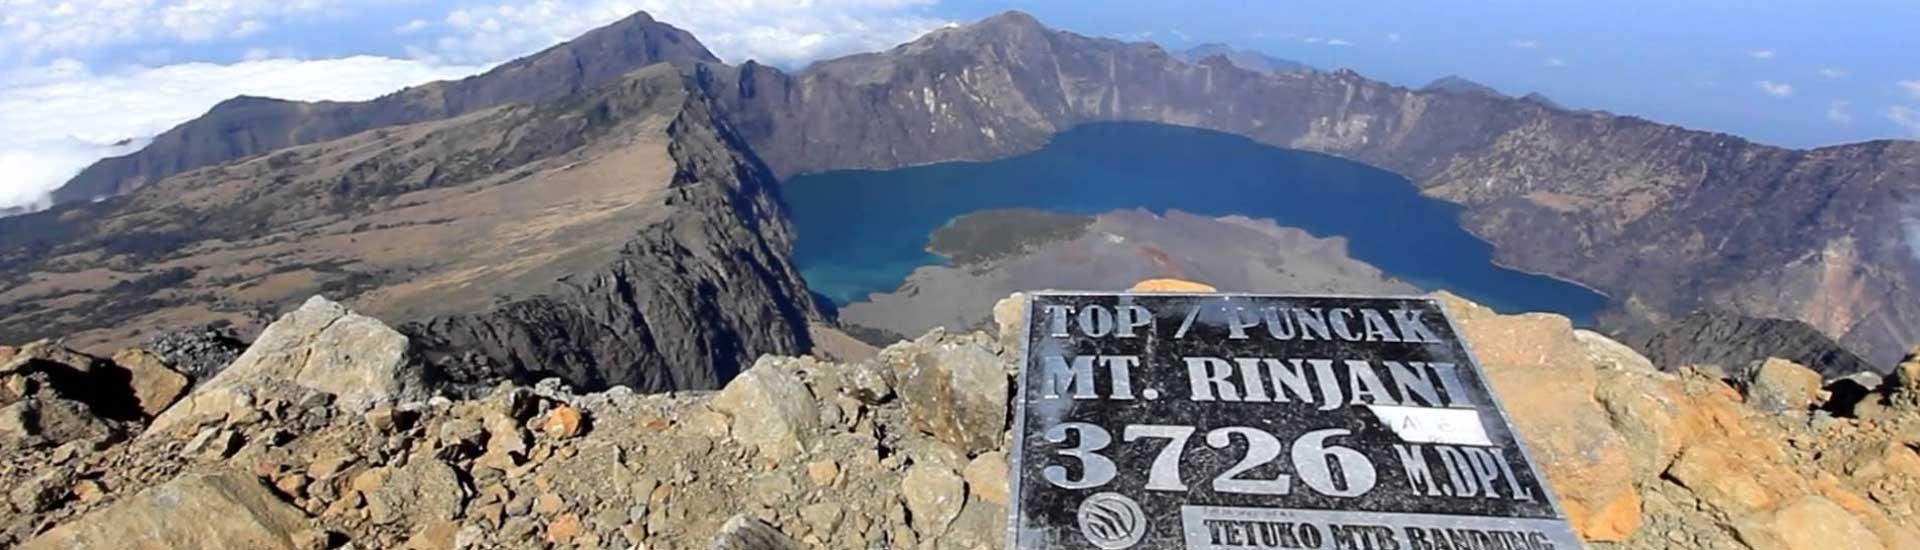 Climbing mount rinjani package lombok island indonesia about us - Lombok Trekking Senaru Lombok Lombok Rinjani Trekking Mount Rinjani National Park Lombok Trekking Rinjani Trekking Climb Rinjani Trek Rinjani